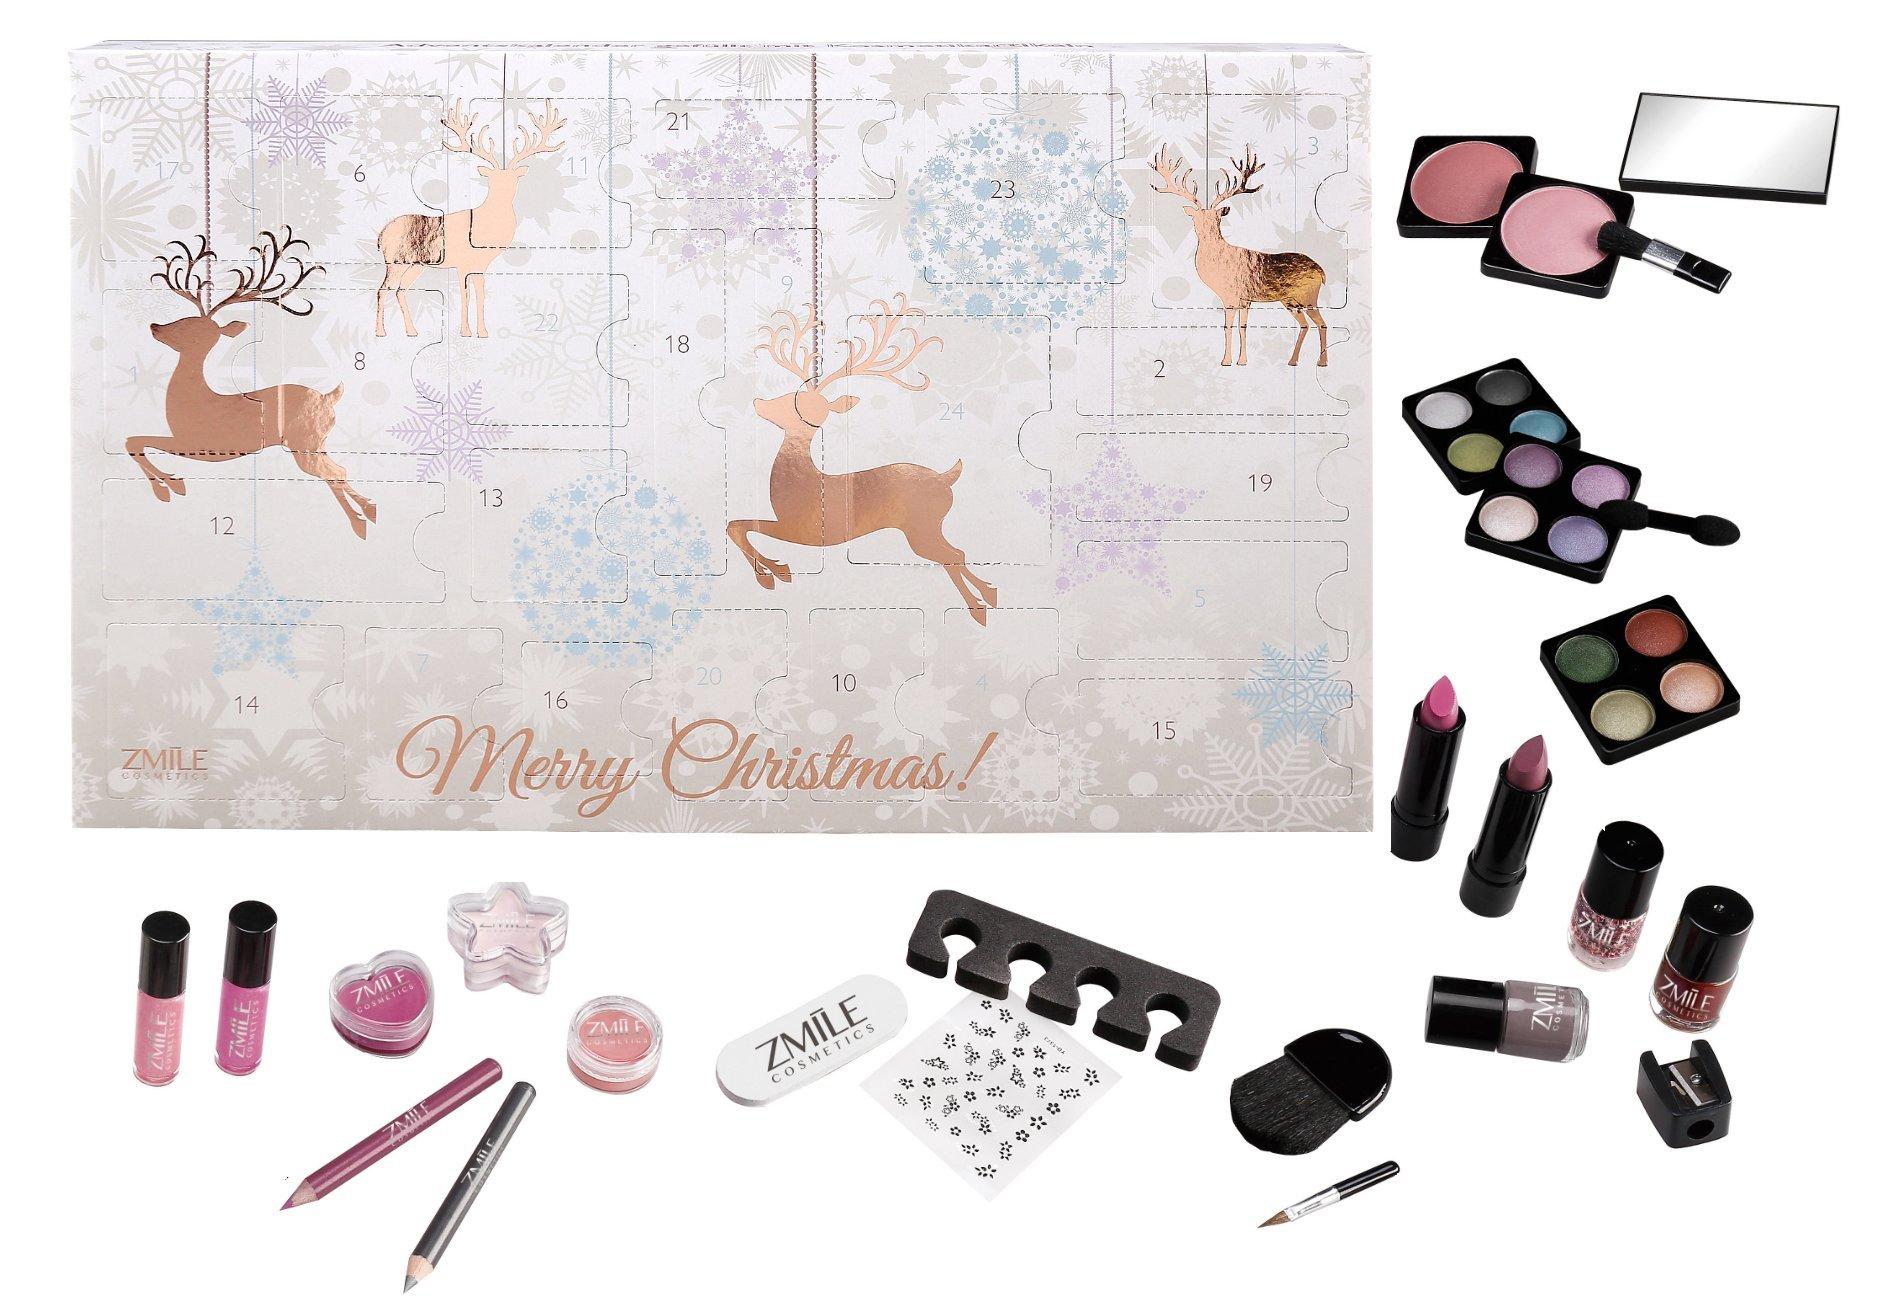 Advento kalendorius - kosmetikos rinkinys Zmile Cosmetics Rentiere Rosegold